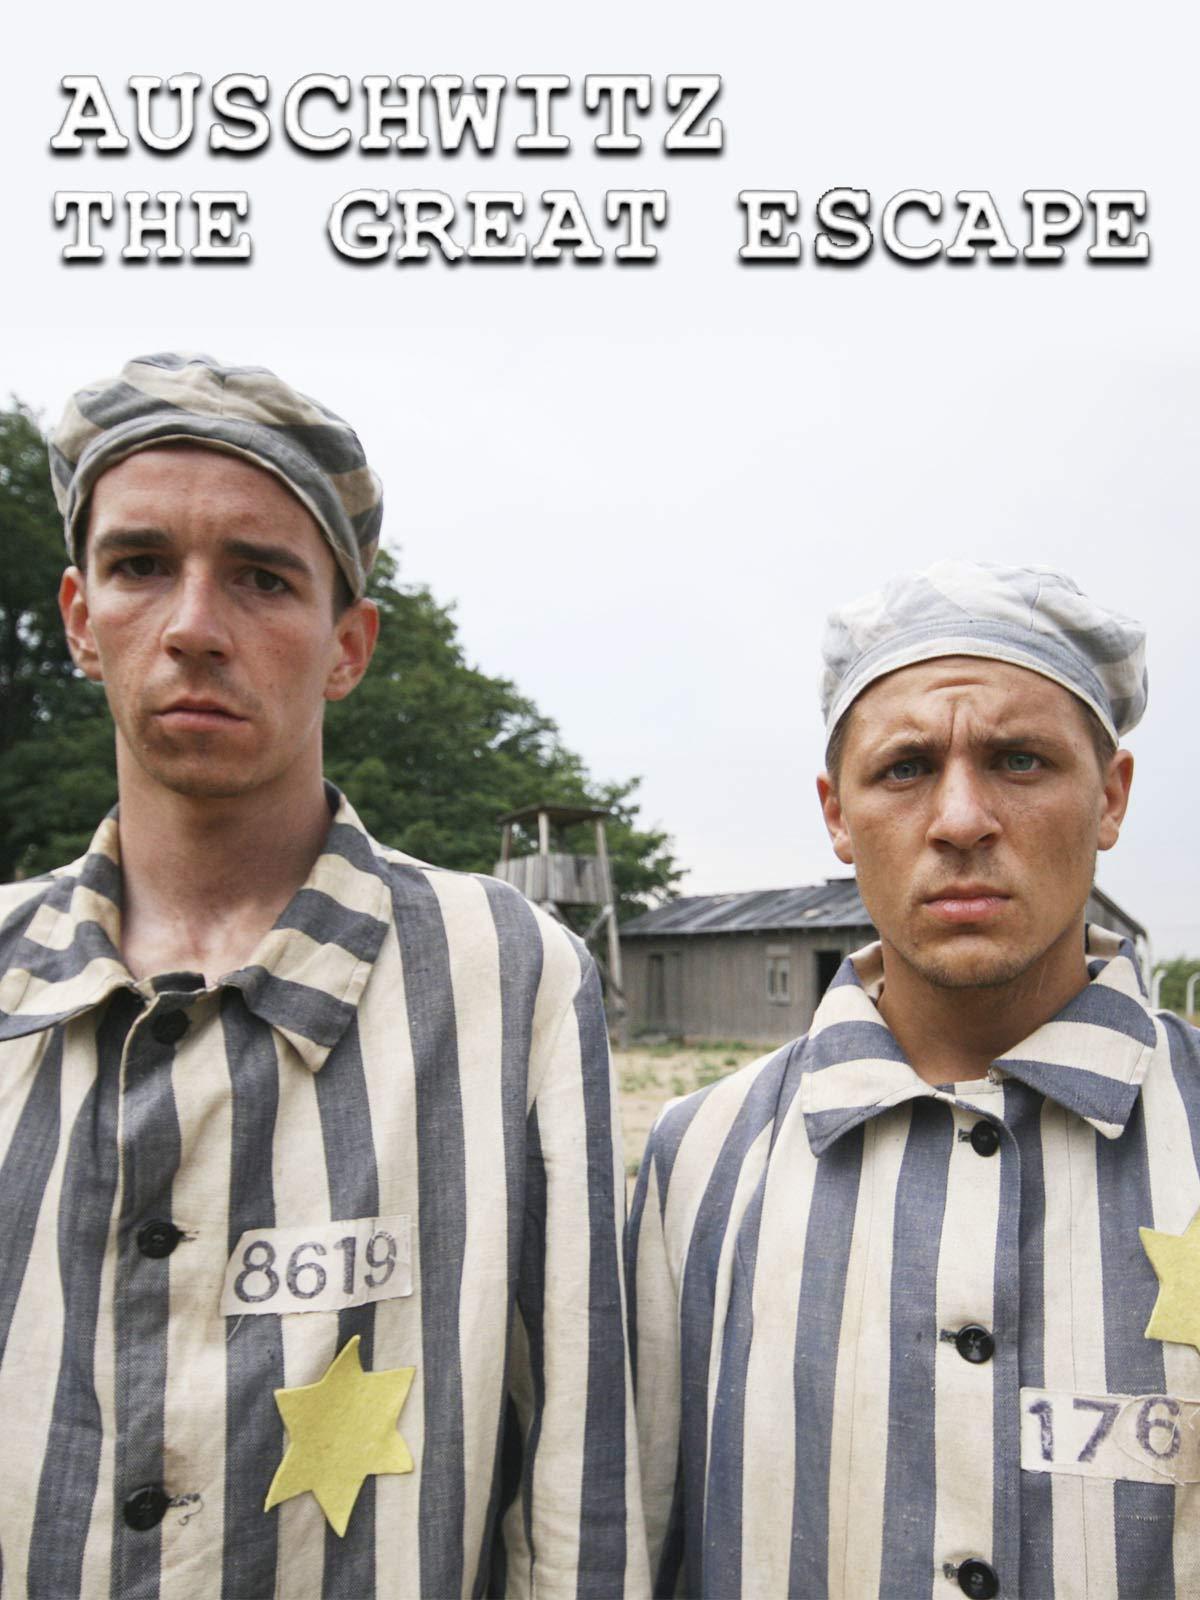 Auschwitz: The Great Escape